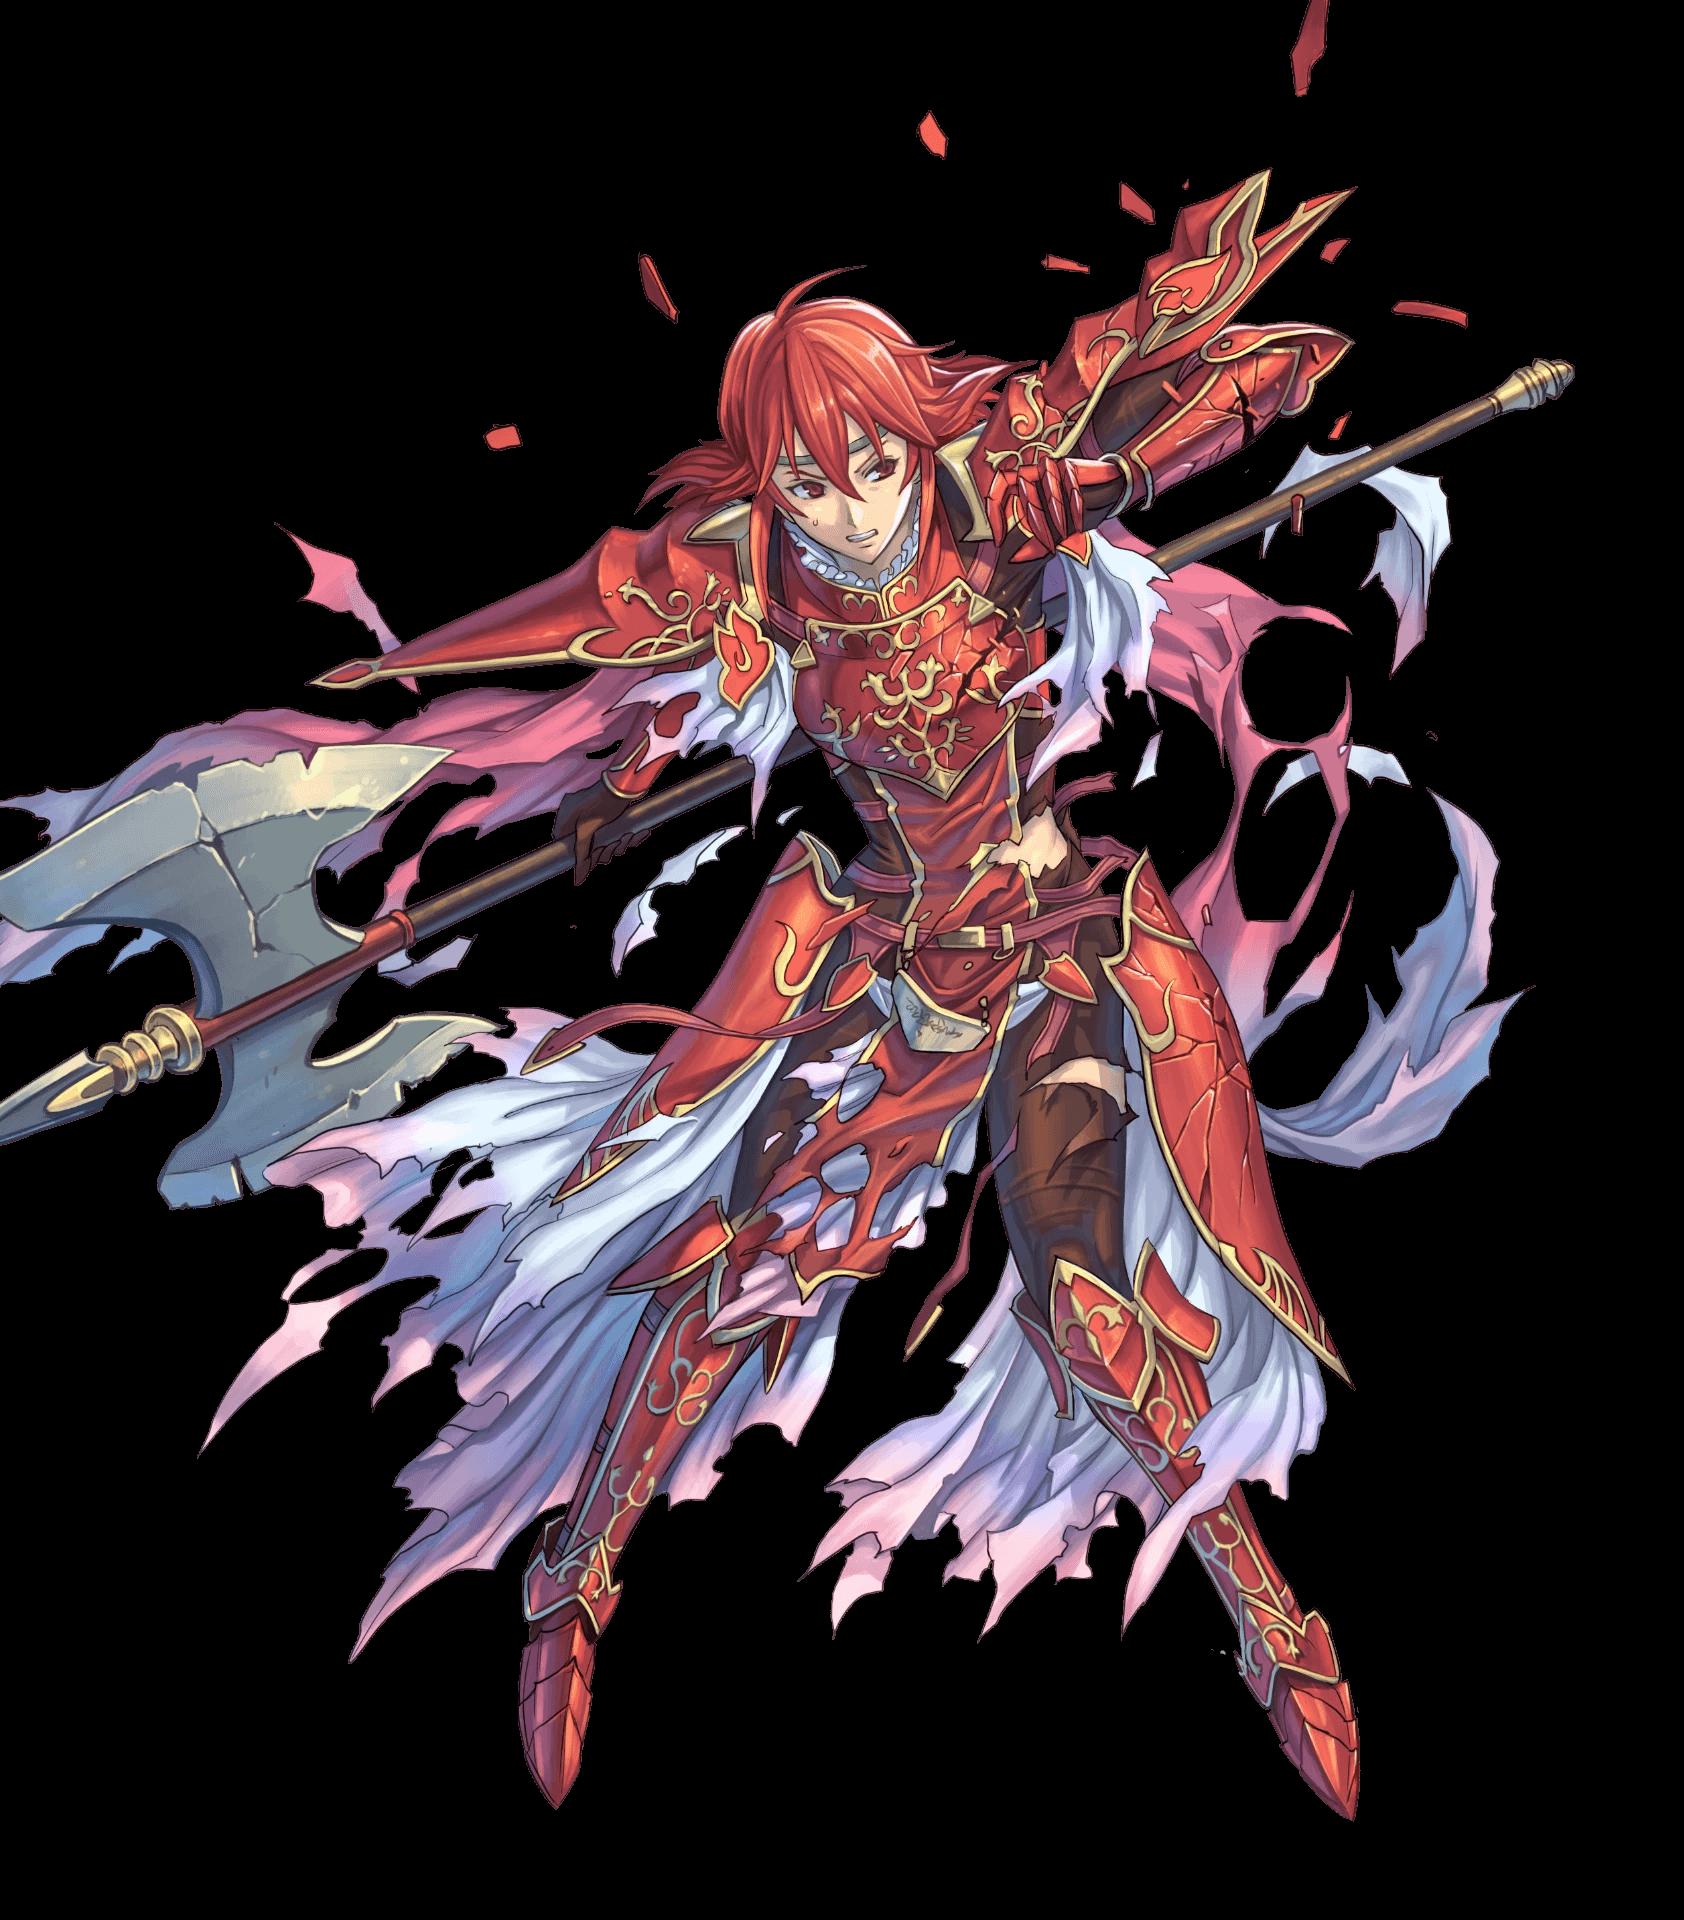 Minerva | Fire Emblem Heroes Wiki - GamePress